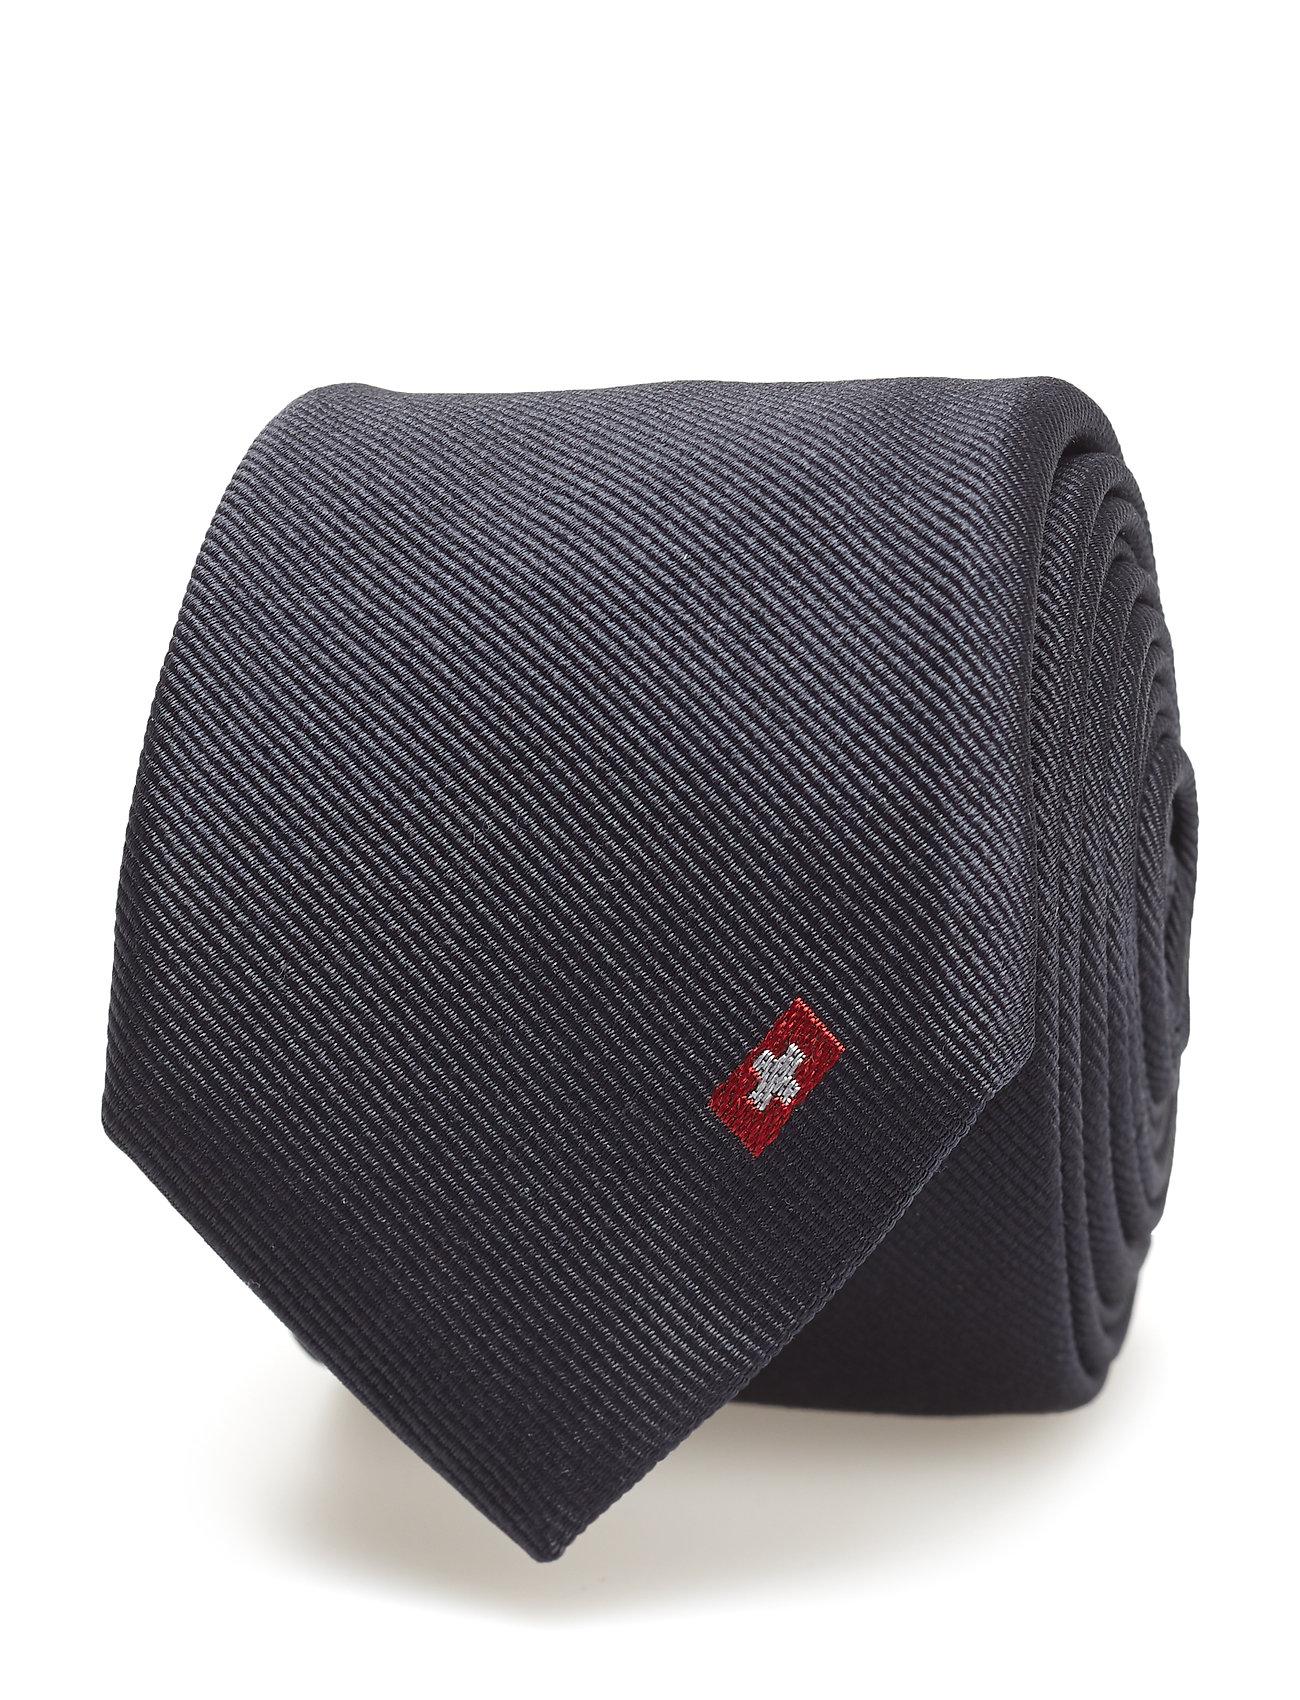 Image of Tie 6 Cm Slips Blå BOSS Business Wear (3333155135)